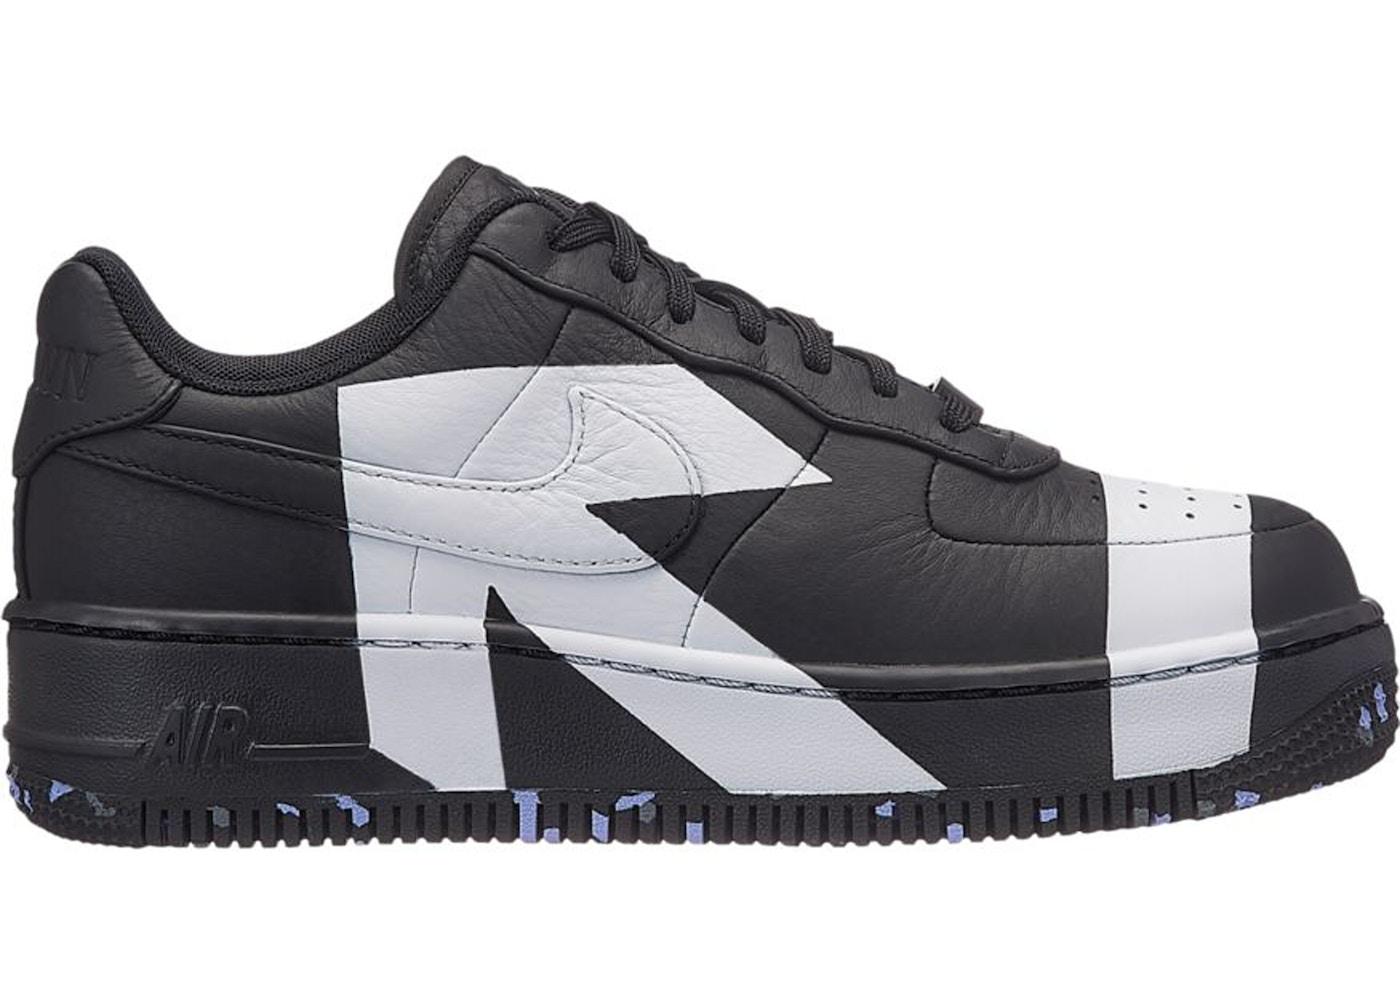 Nike Air Force 1 Upstep Lux Black (W) - 898421-001